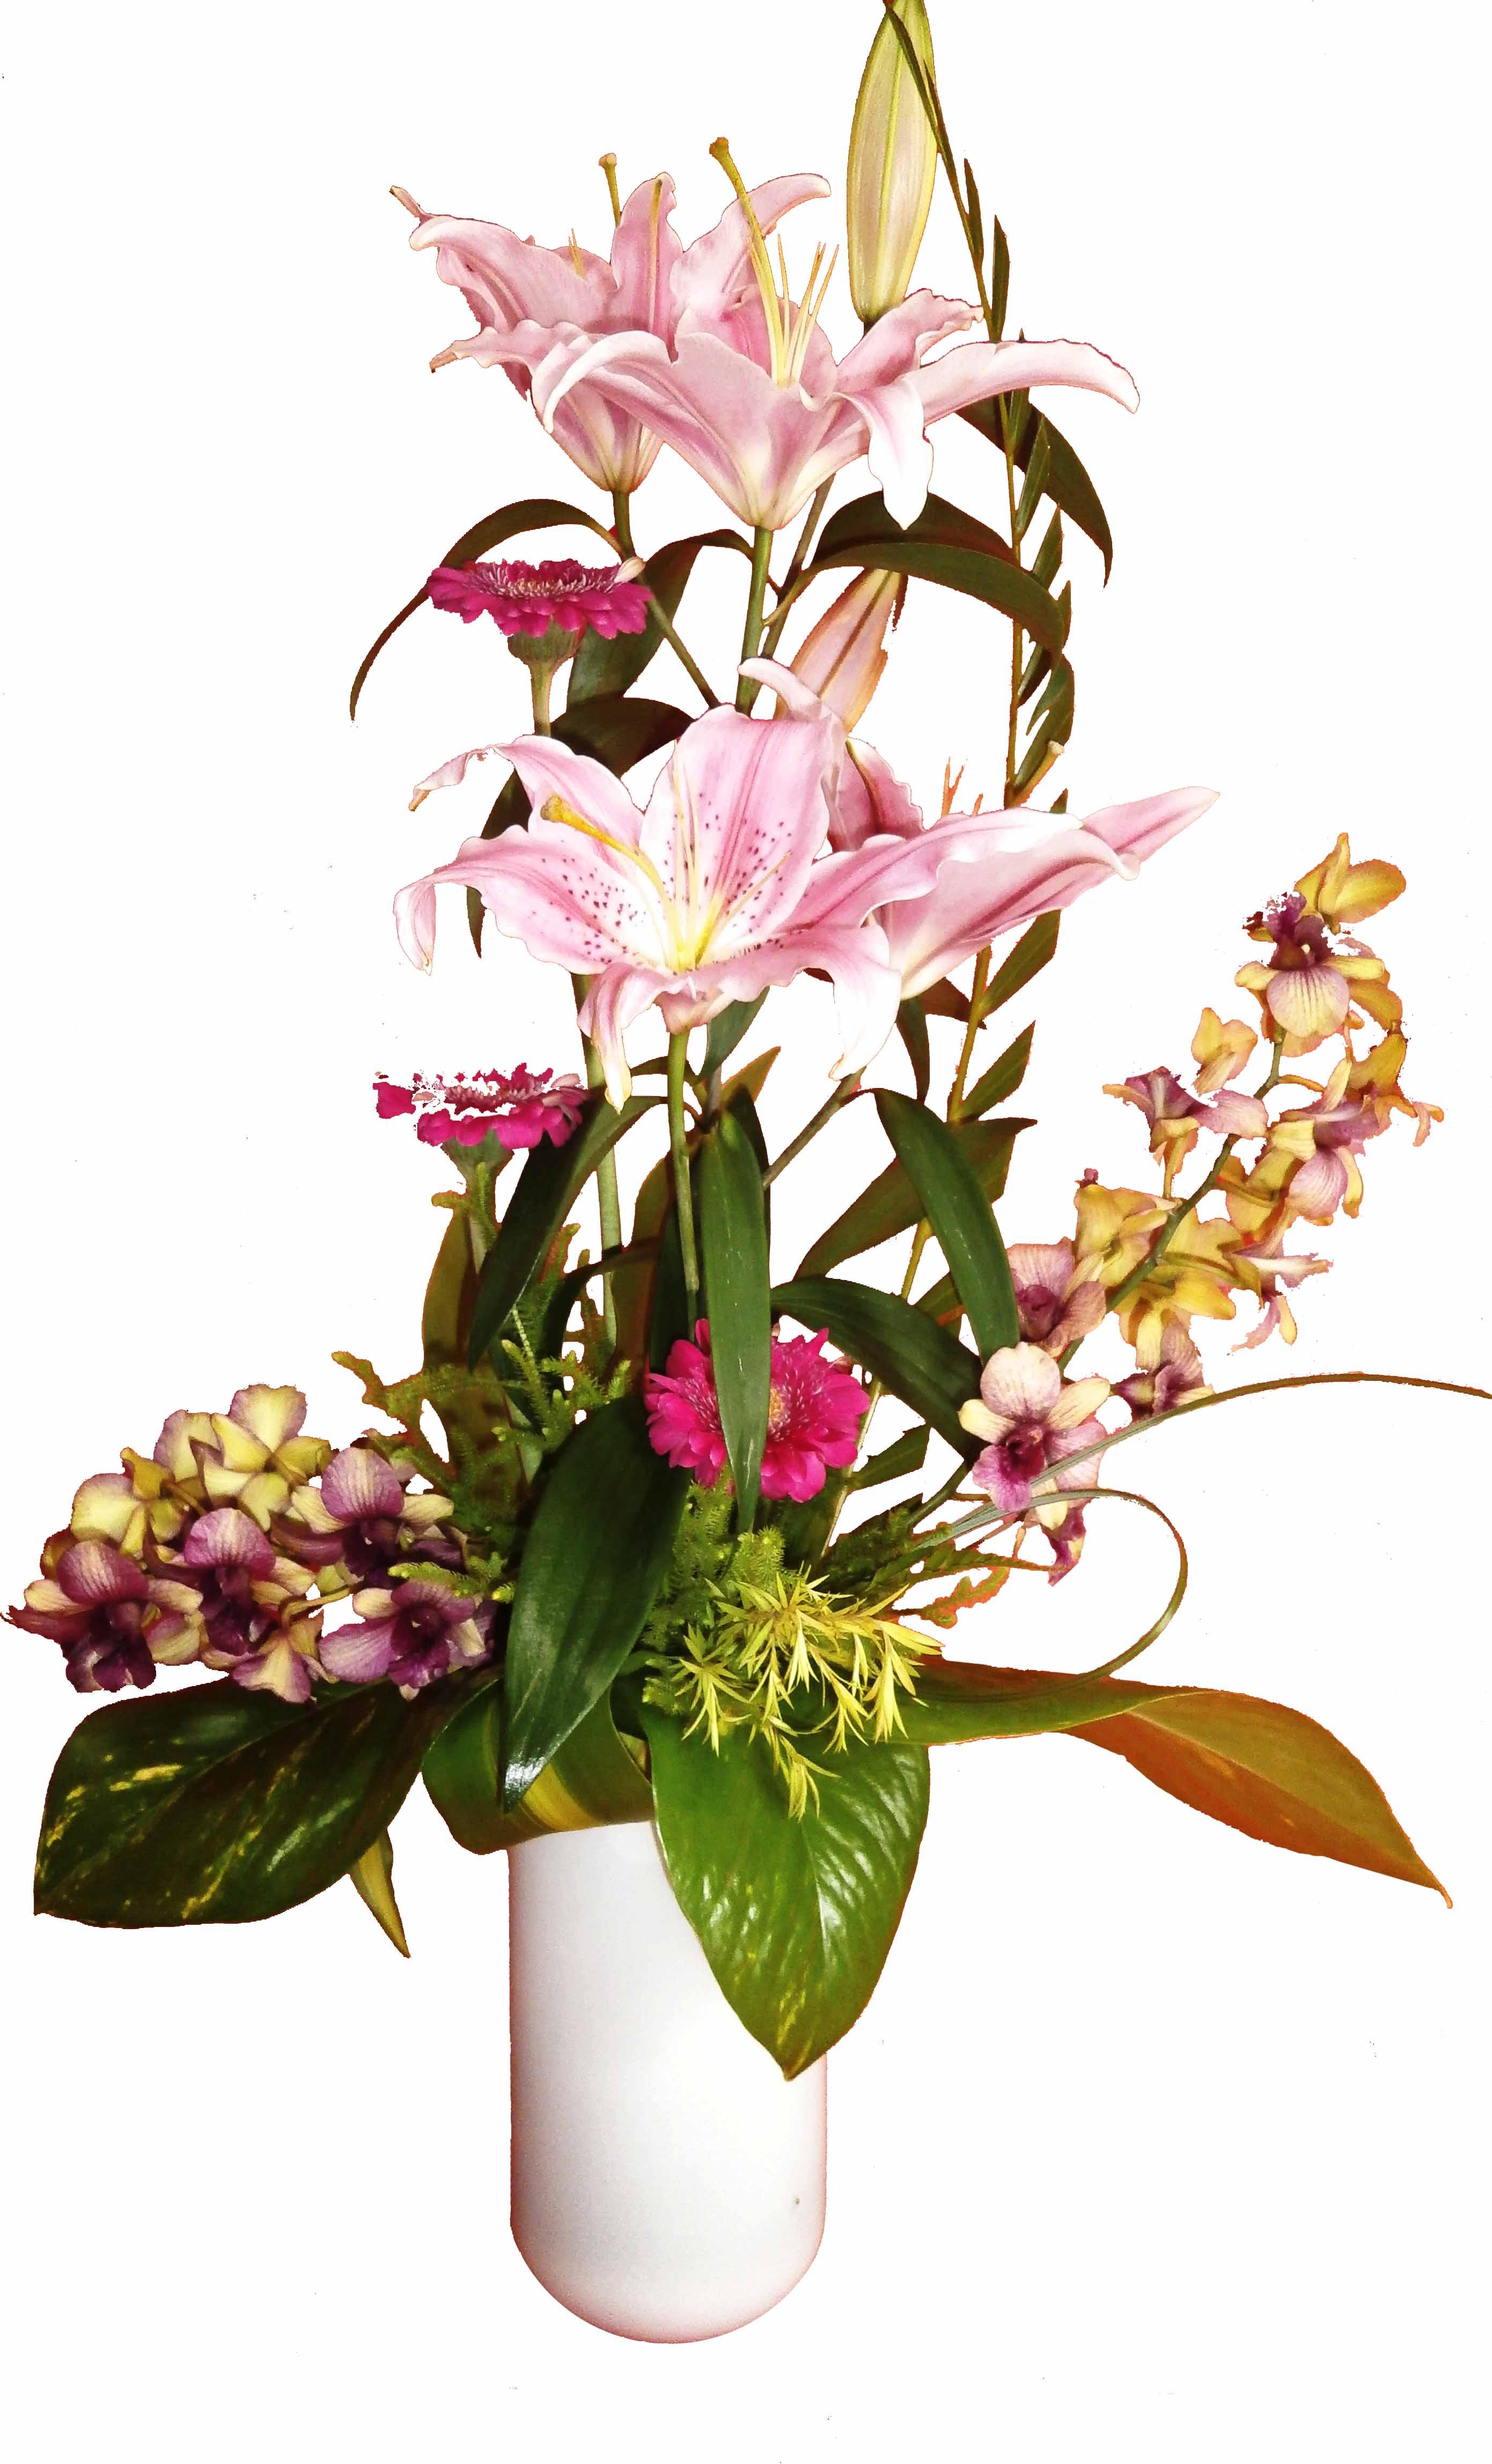 Tarona l 39 artisan fleuriste tahiti fleurs le for Fleurs de fleuriste